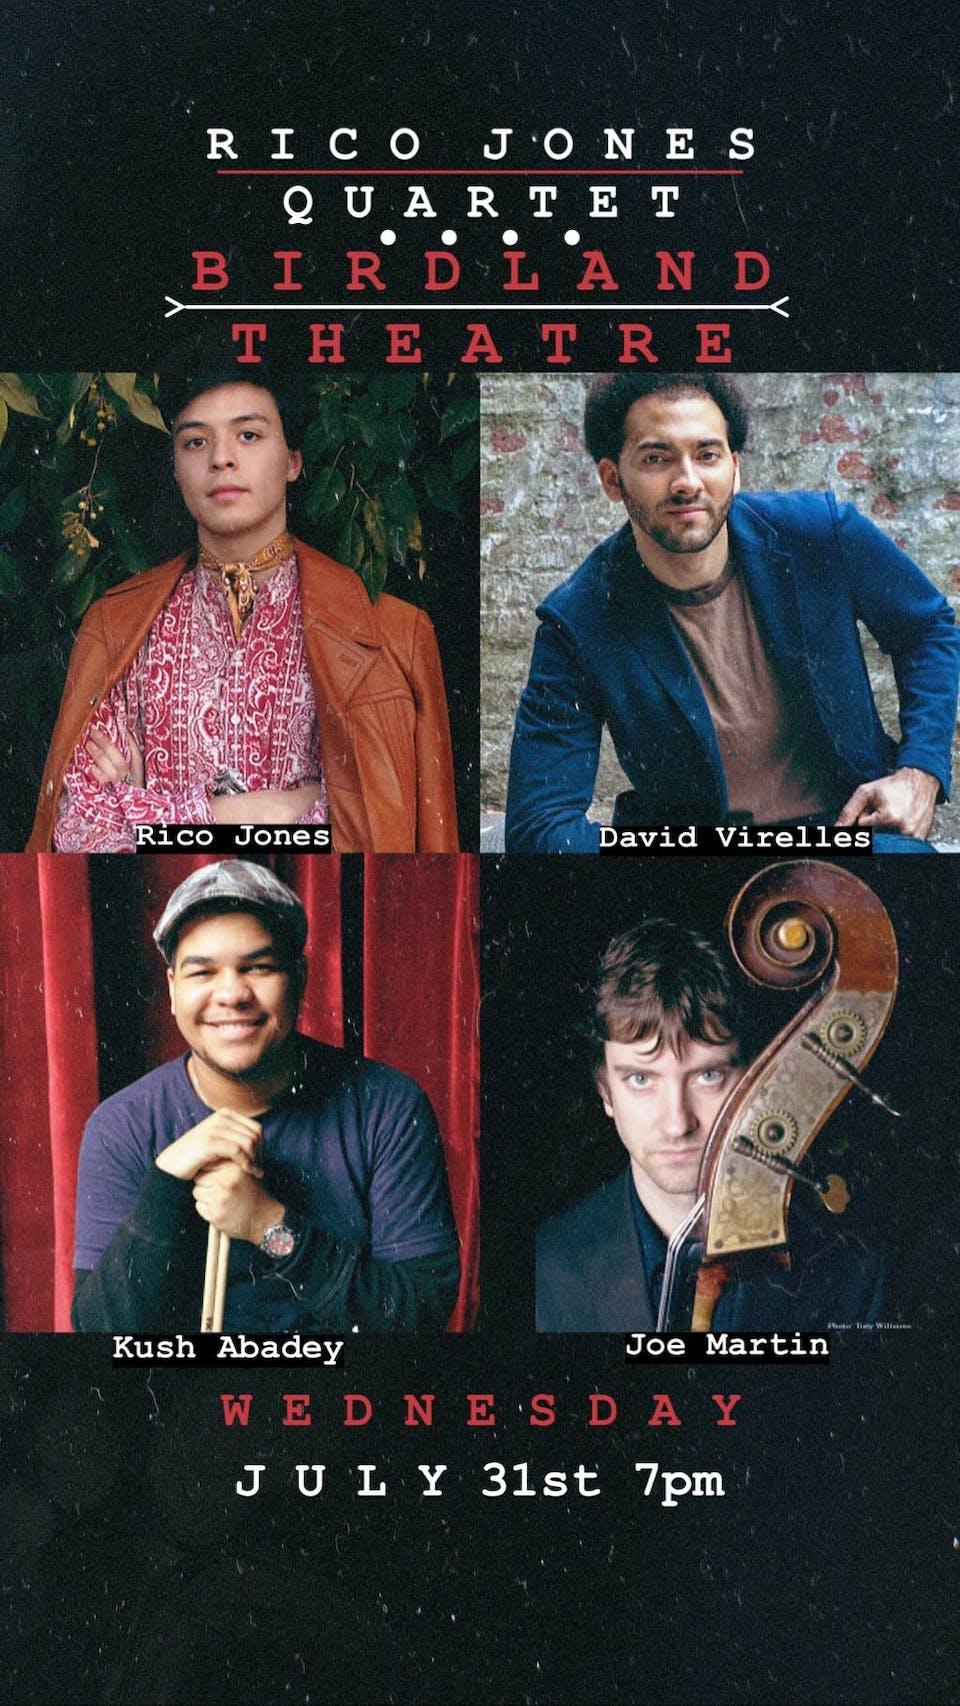 Rico Jones Quartet with David Virelles, Kush Abadey, and Joe Martin